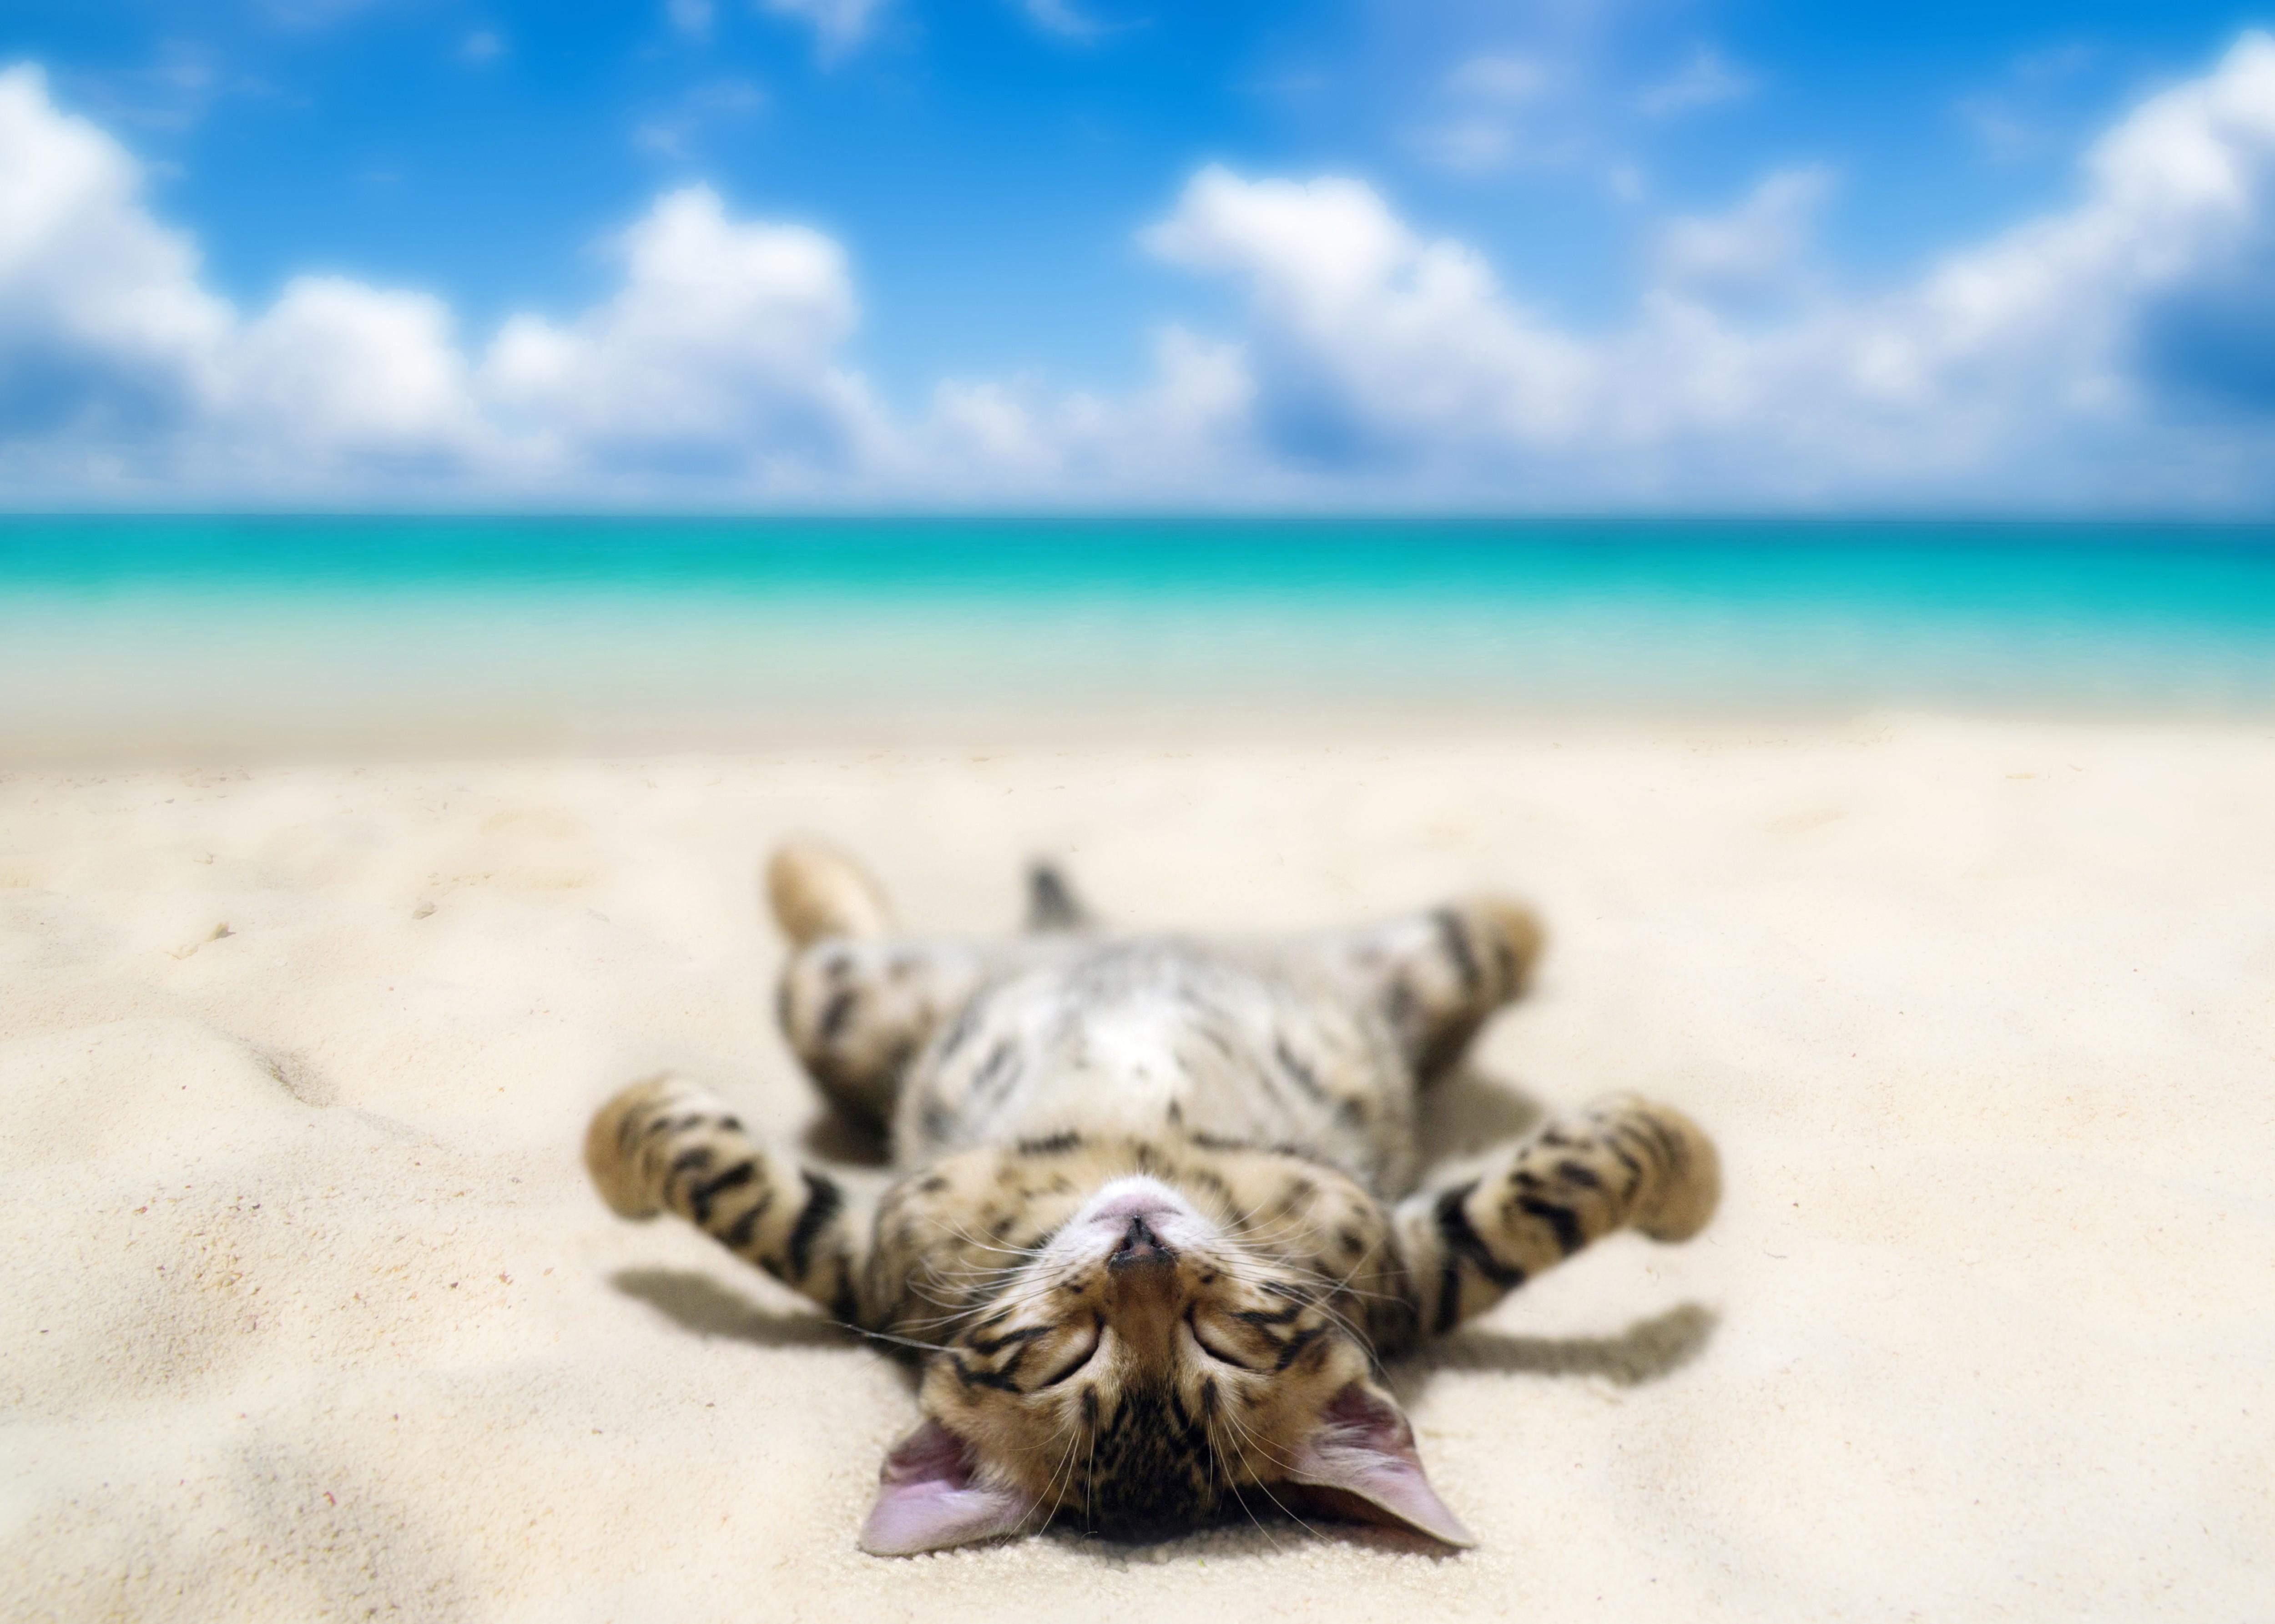 кошка солнце природа бесплатно